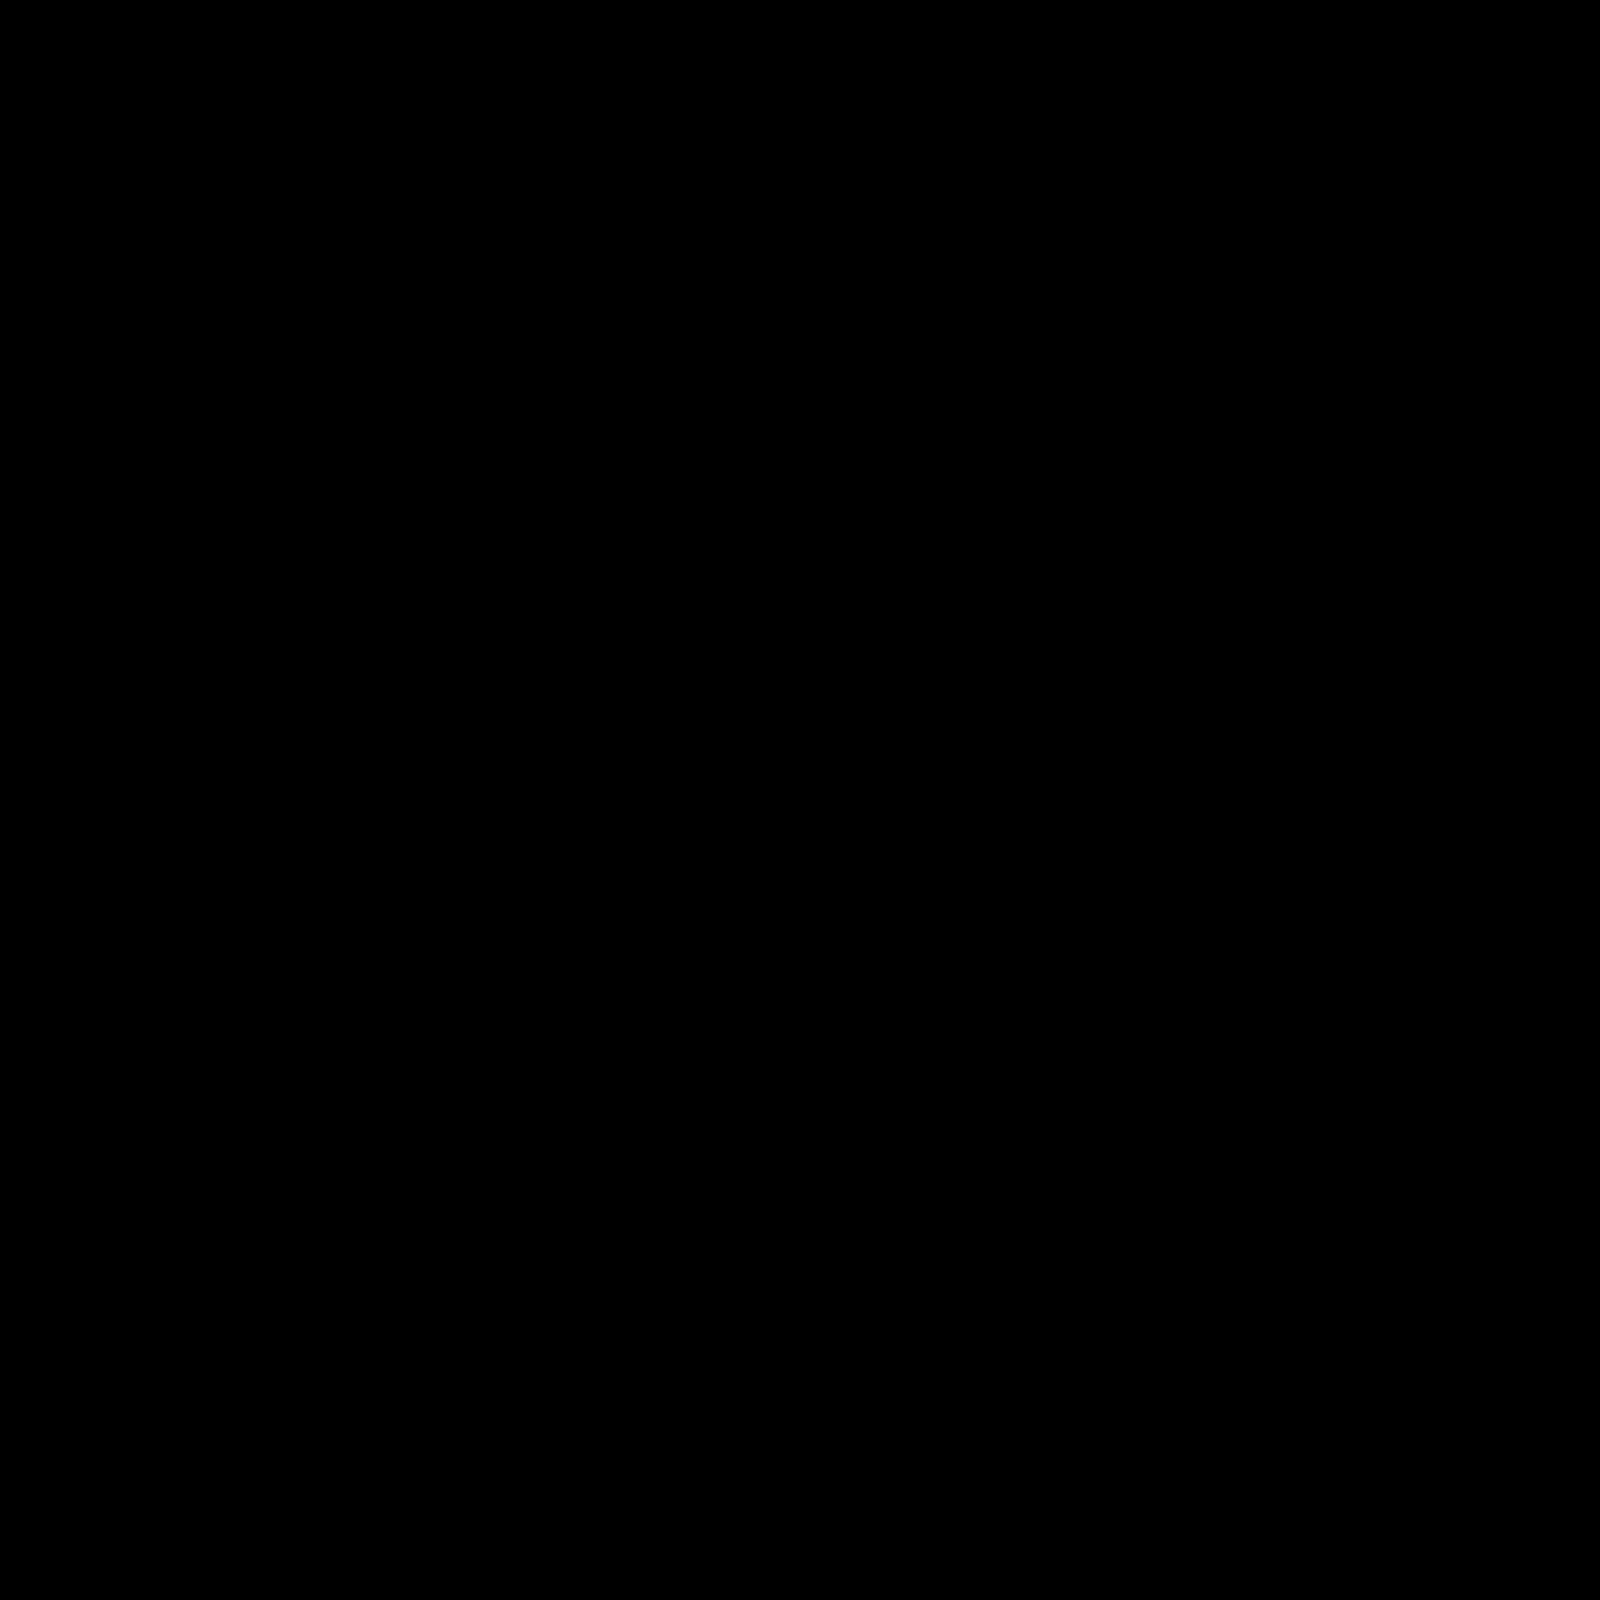 Odometer icon